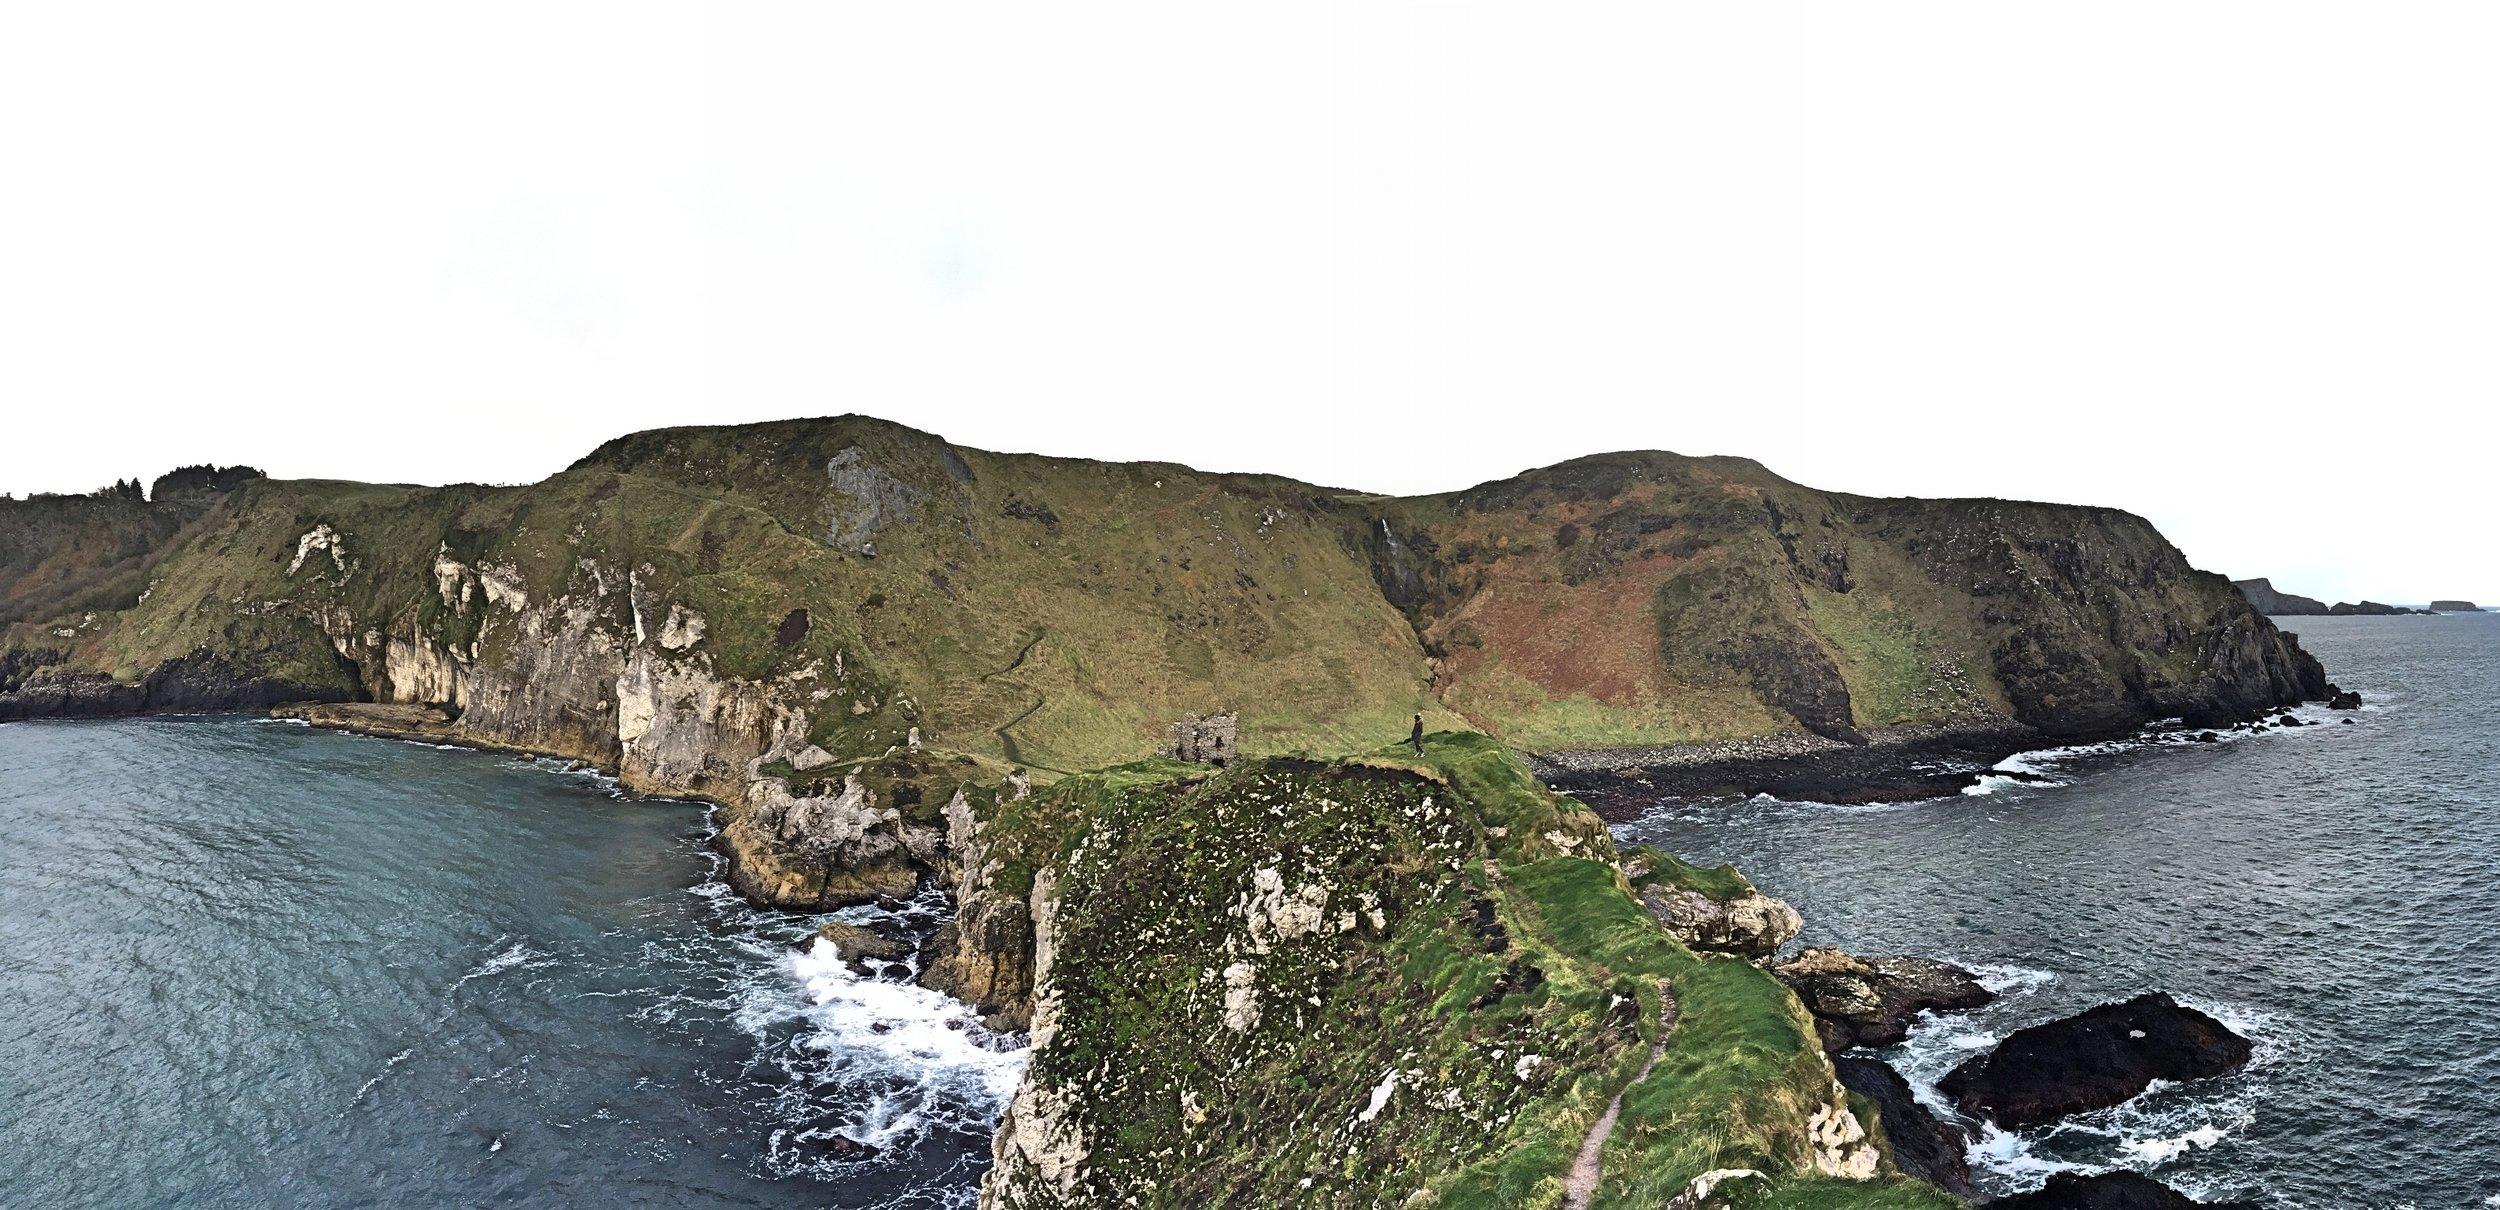 kinbane_head_castle_ni_explorer_northern_ireland